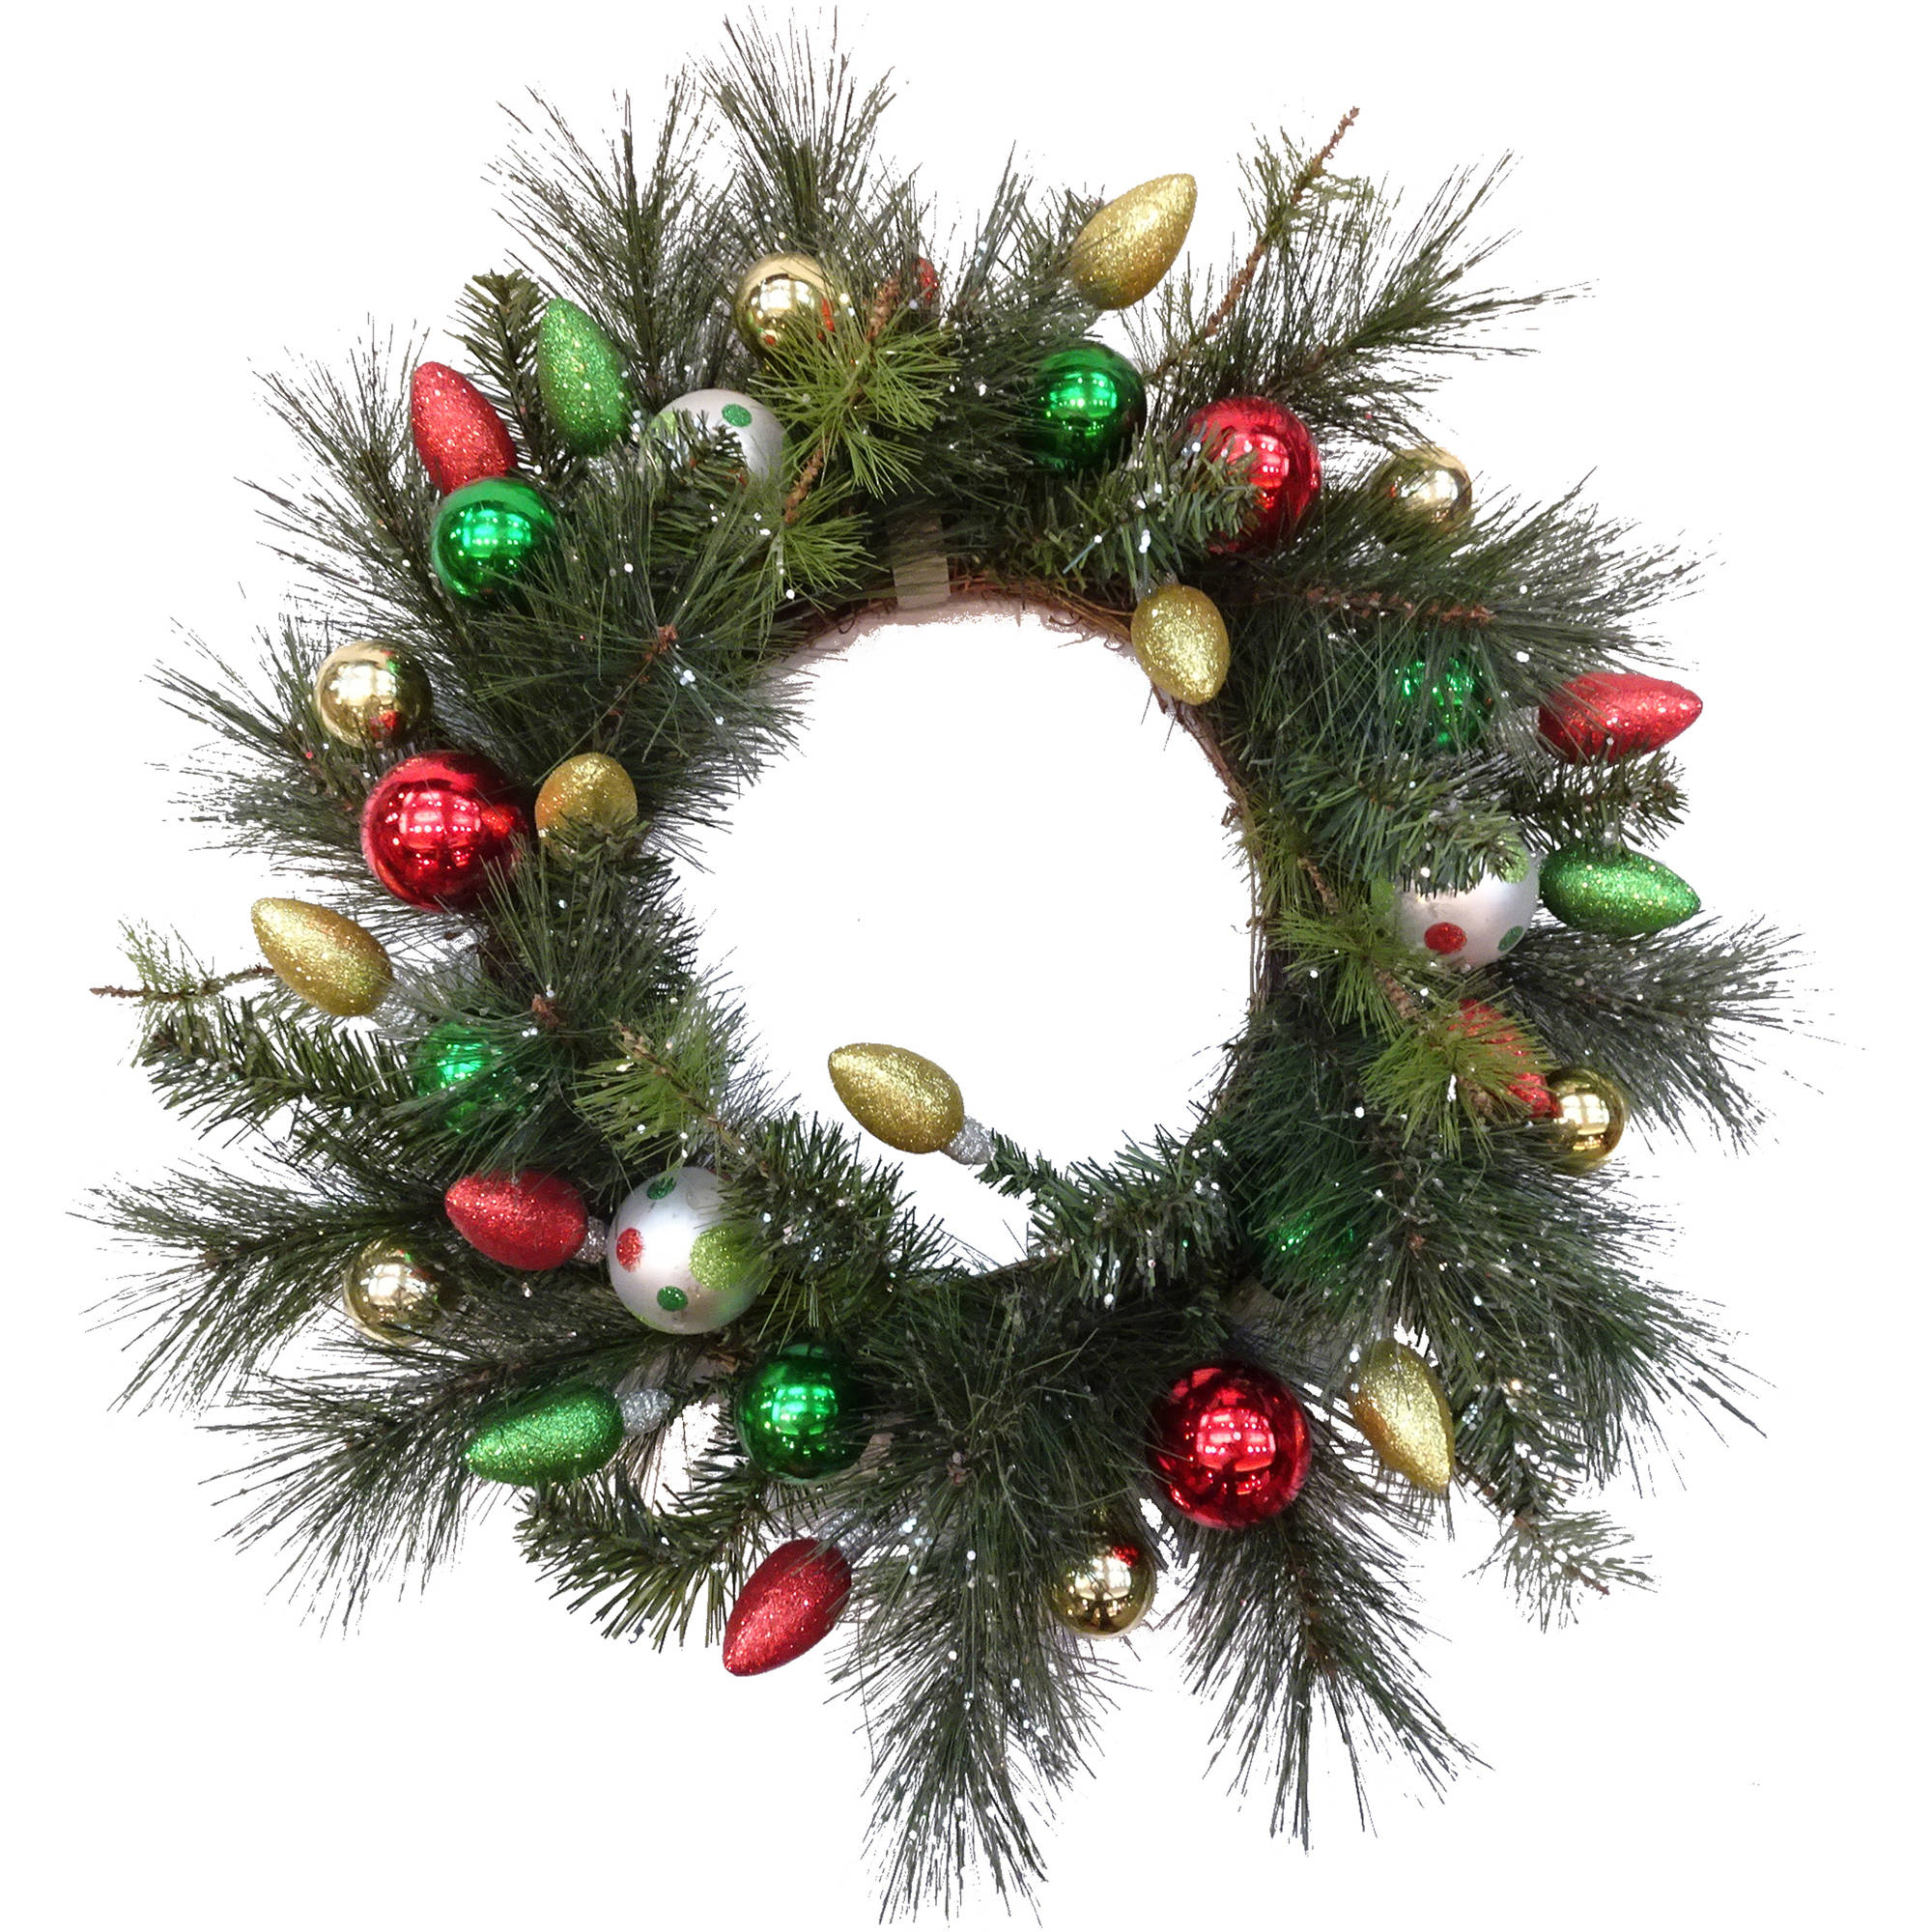 Deluxe Christmas Ornamental Ball Wreath